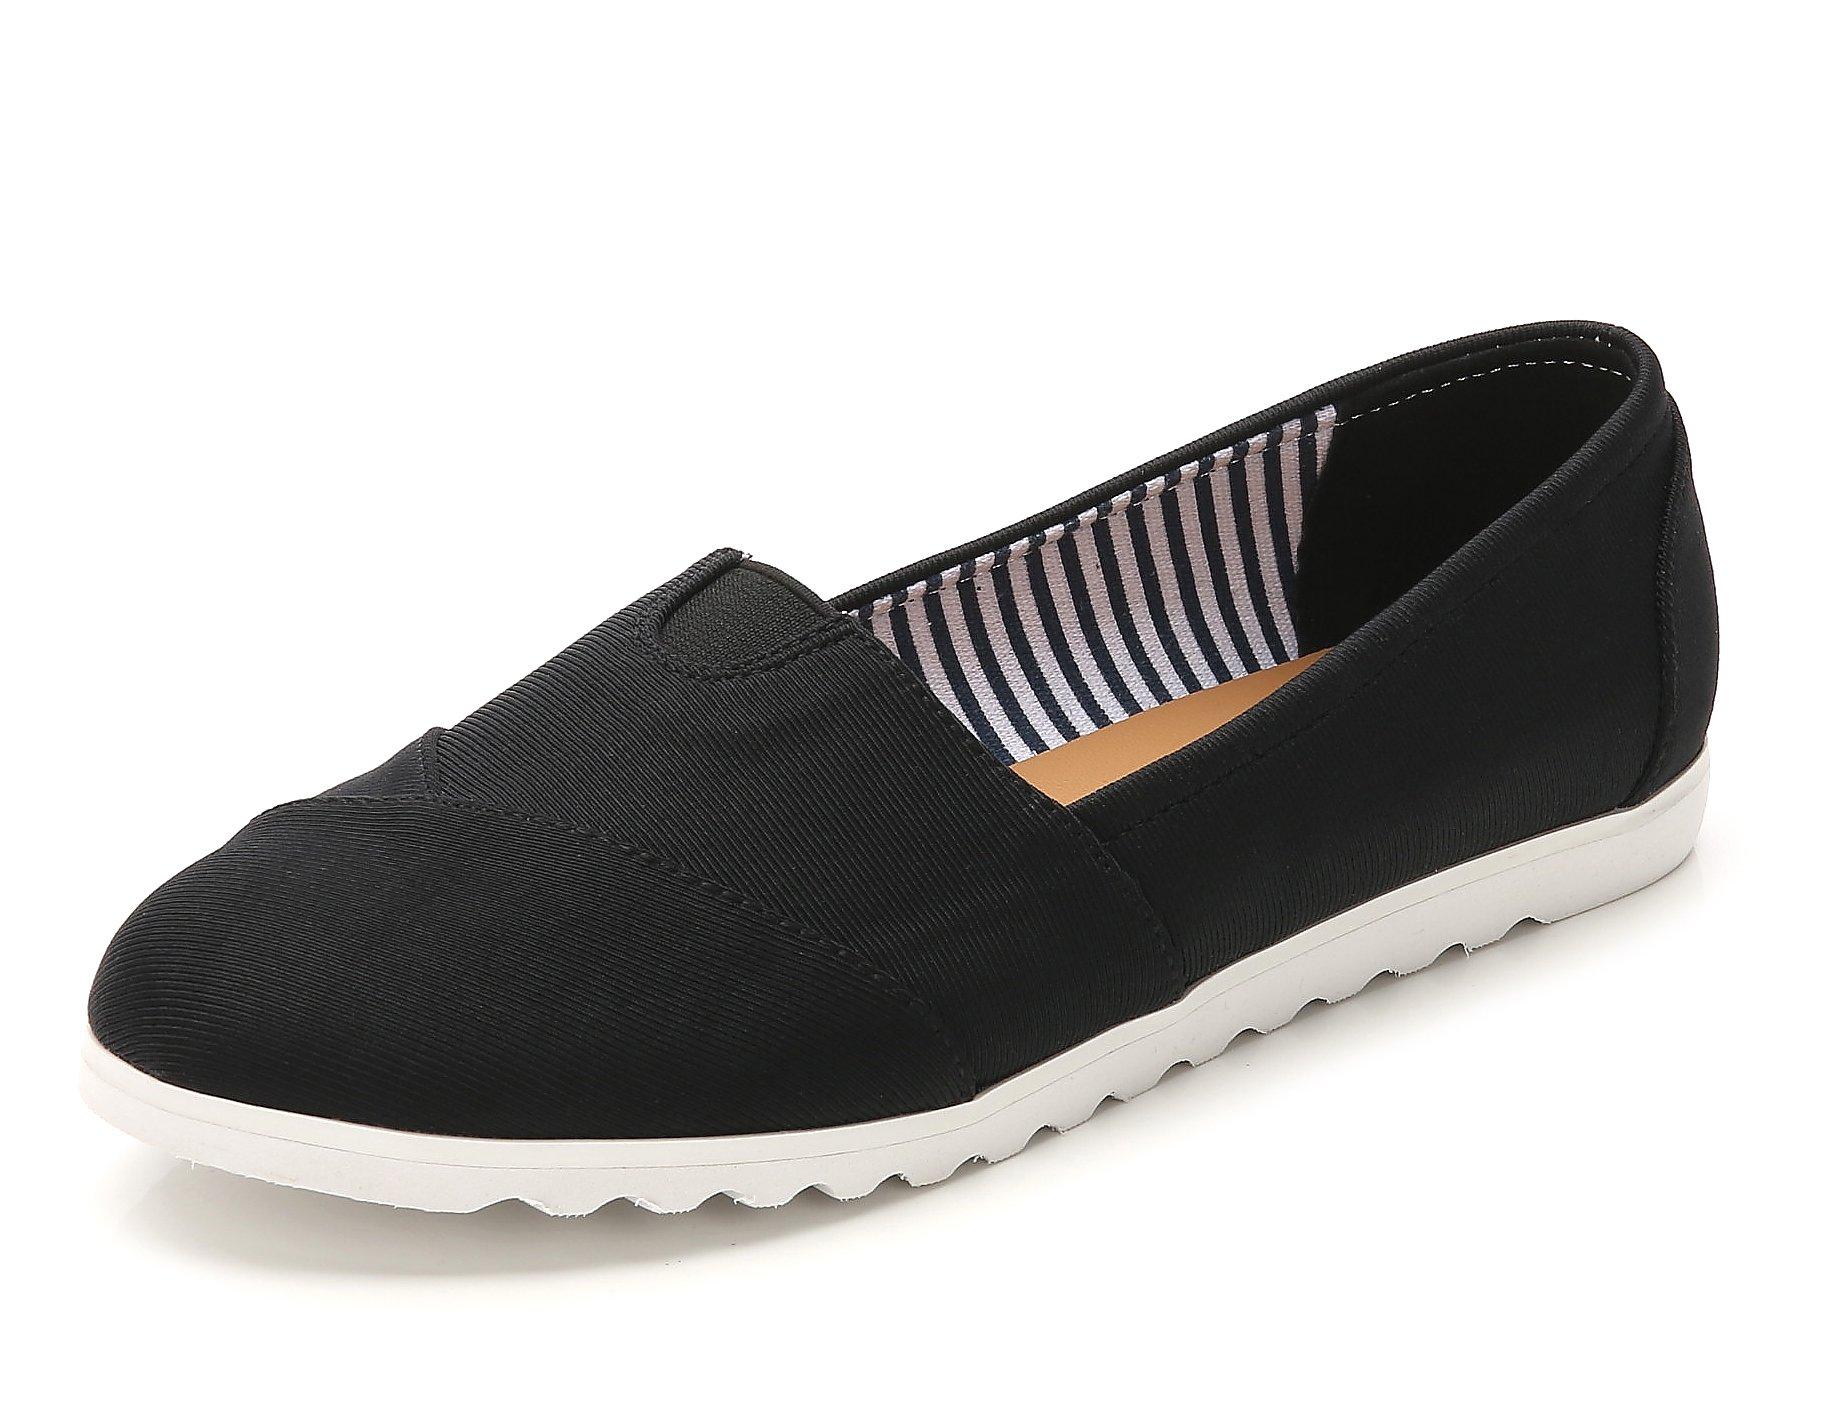 ComeShun Womens Shoes Classic Flats Comfort Slip On Sneakers (39 EU/8 US, Black)